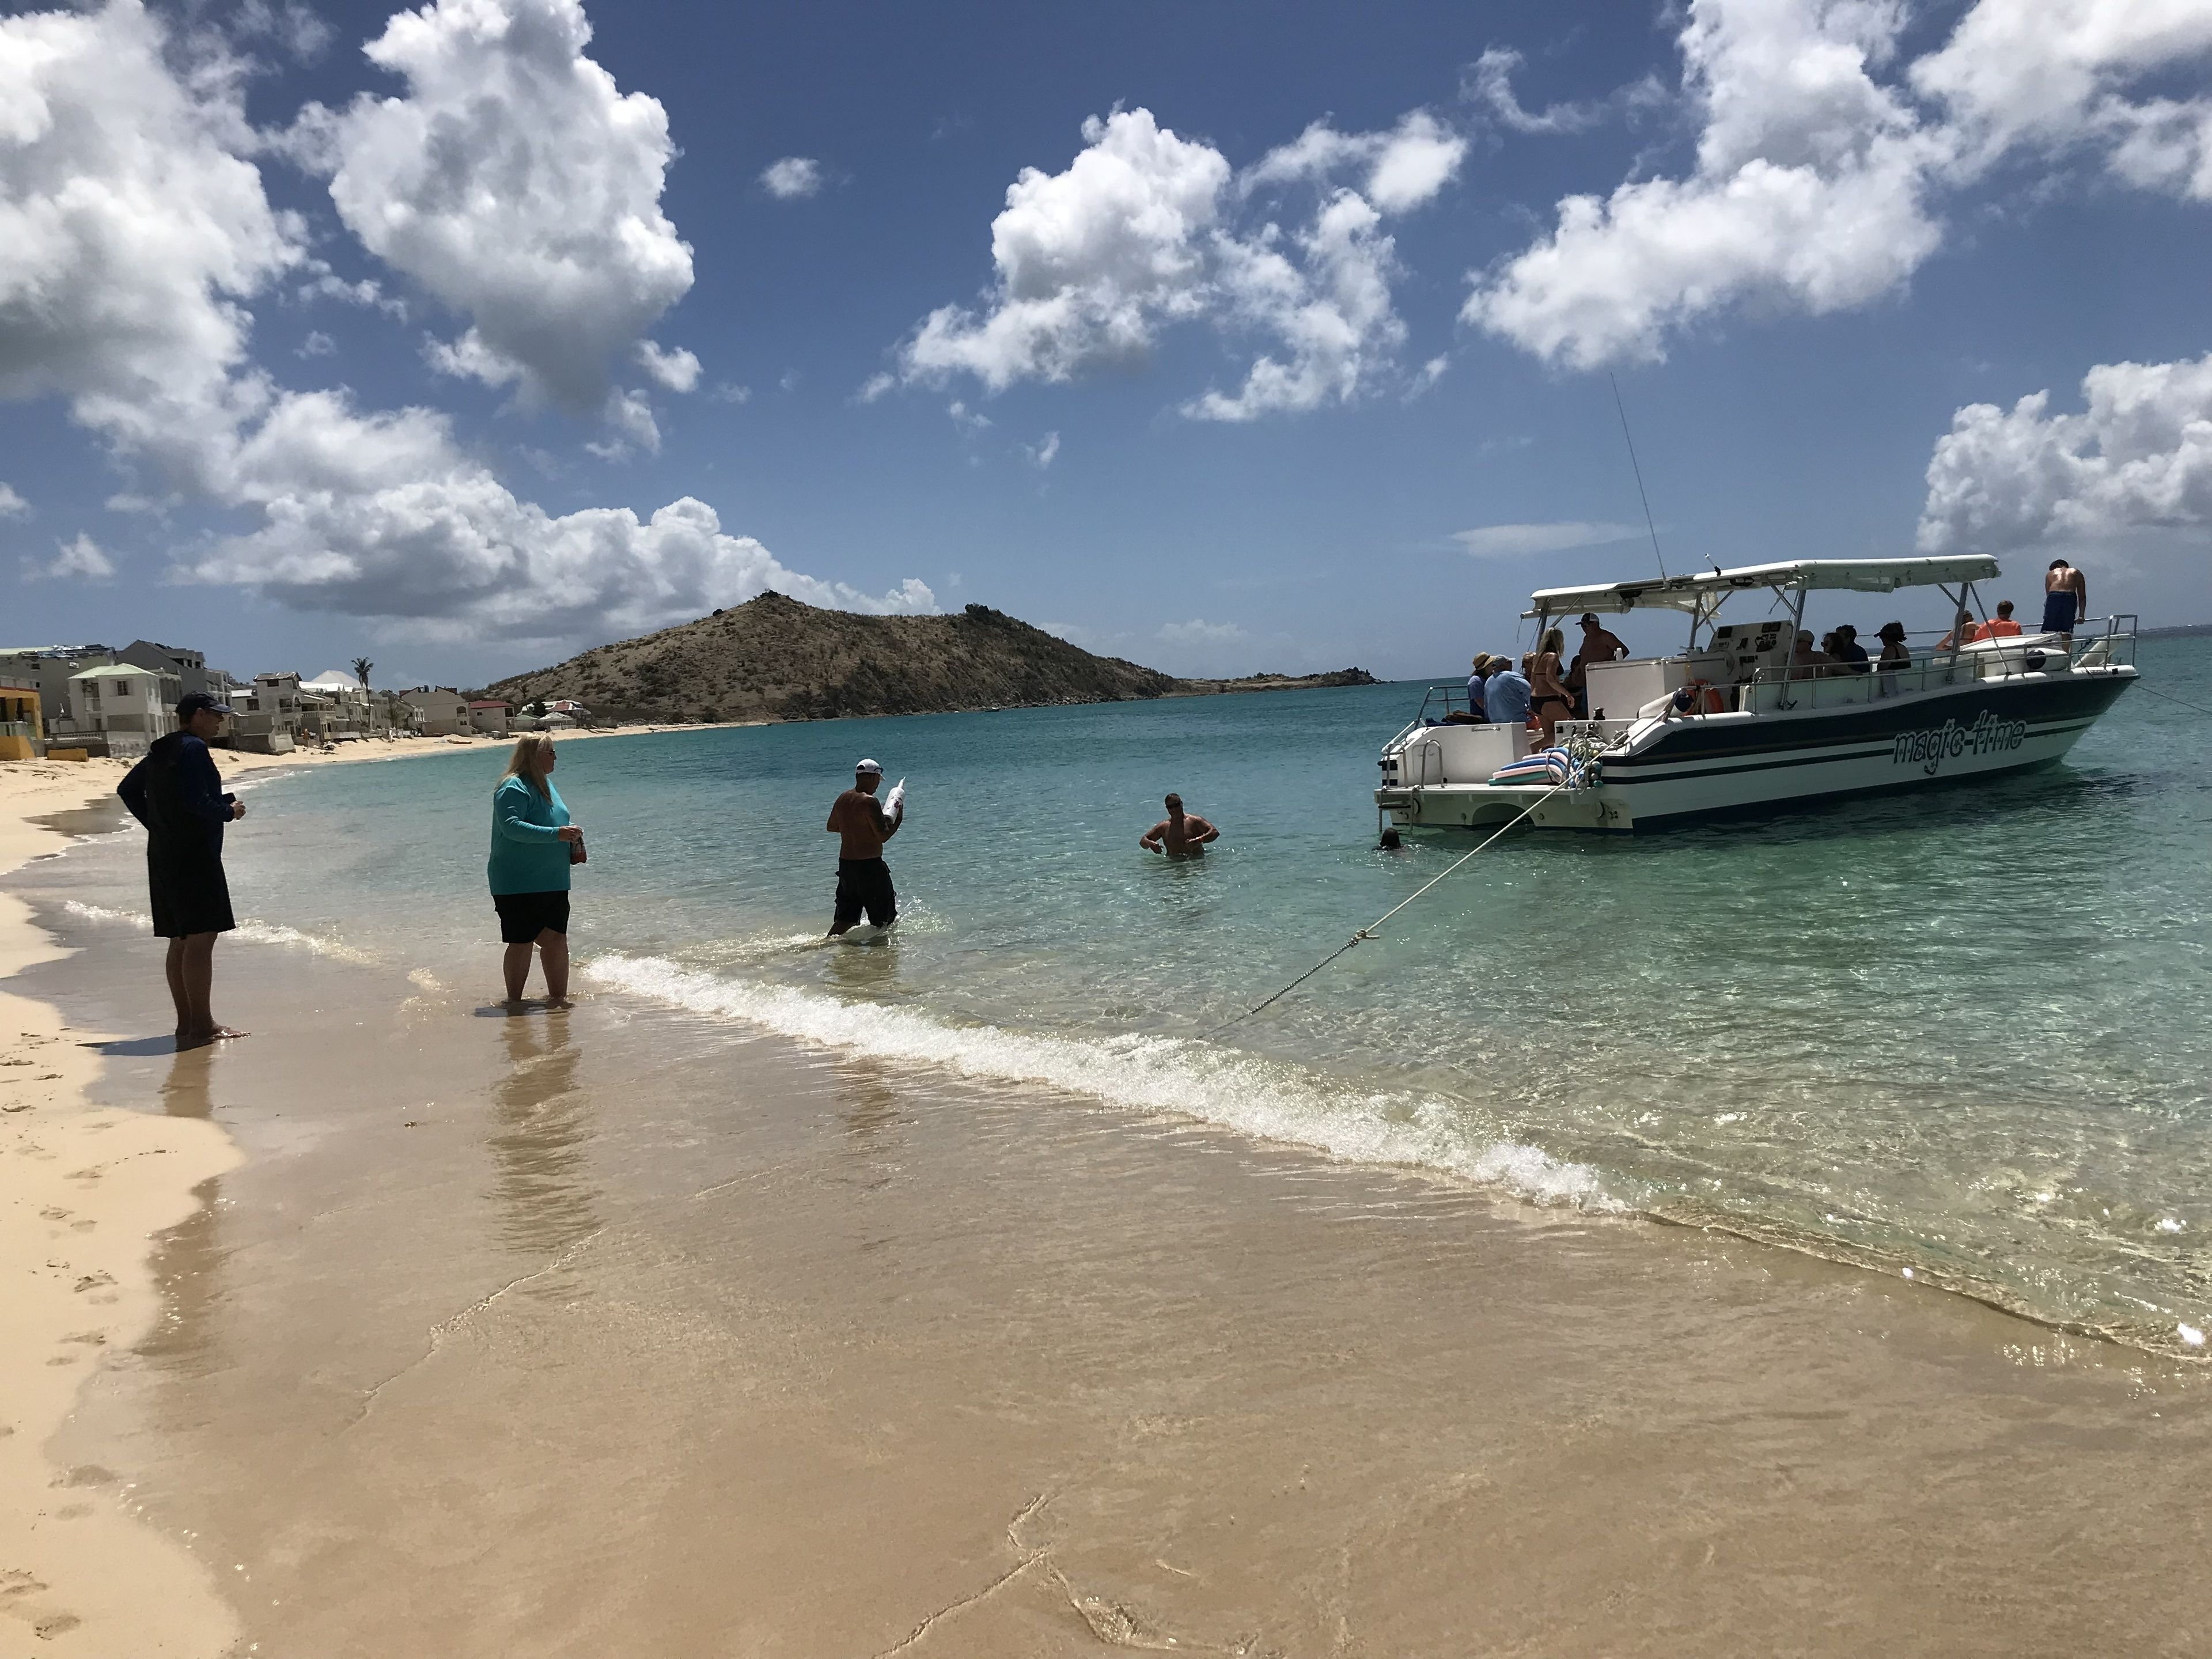 Ultimate Eco Tour Snorkelling, Sightseeing on Power Catamaran